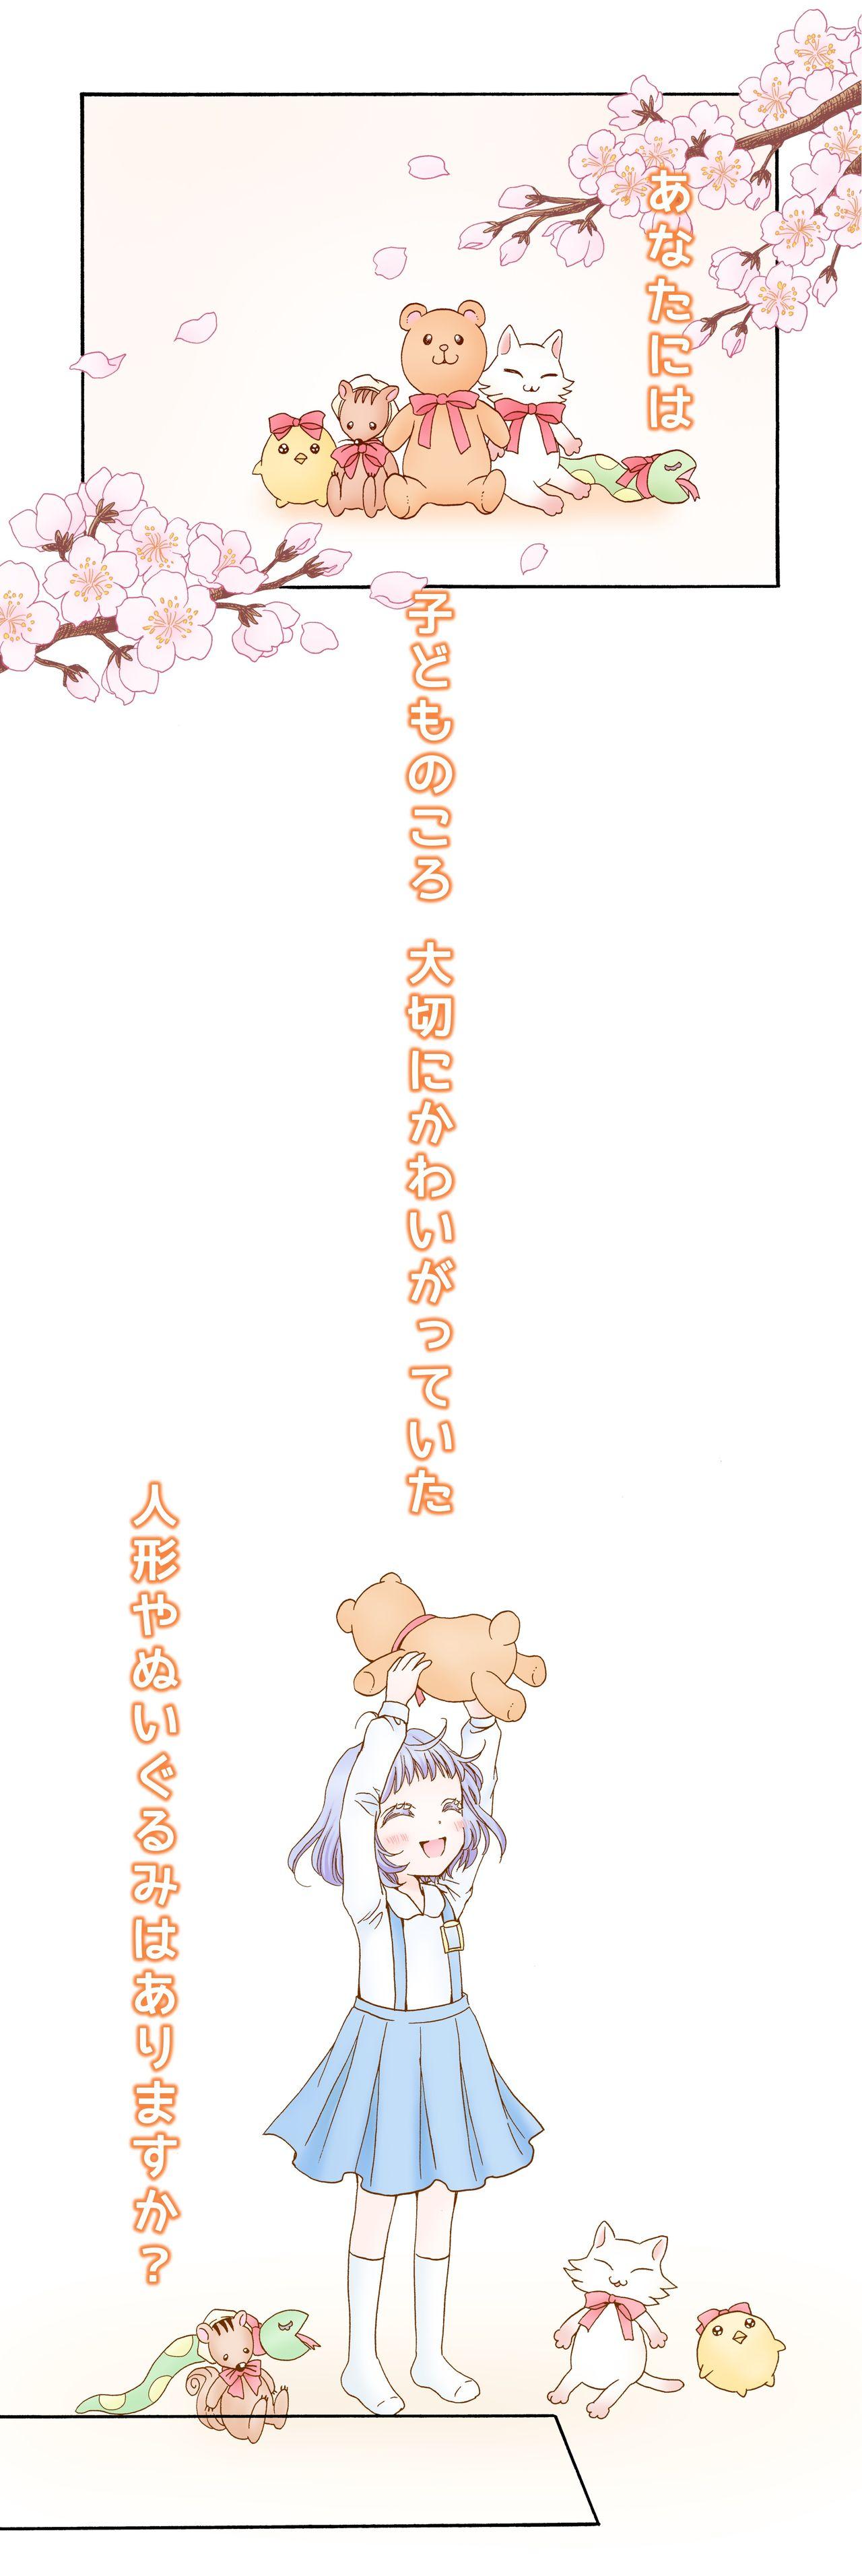 BKS_yokoku_KAKO01 - 01001